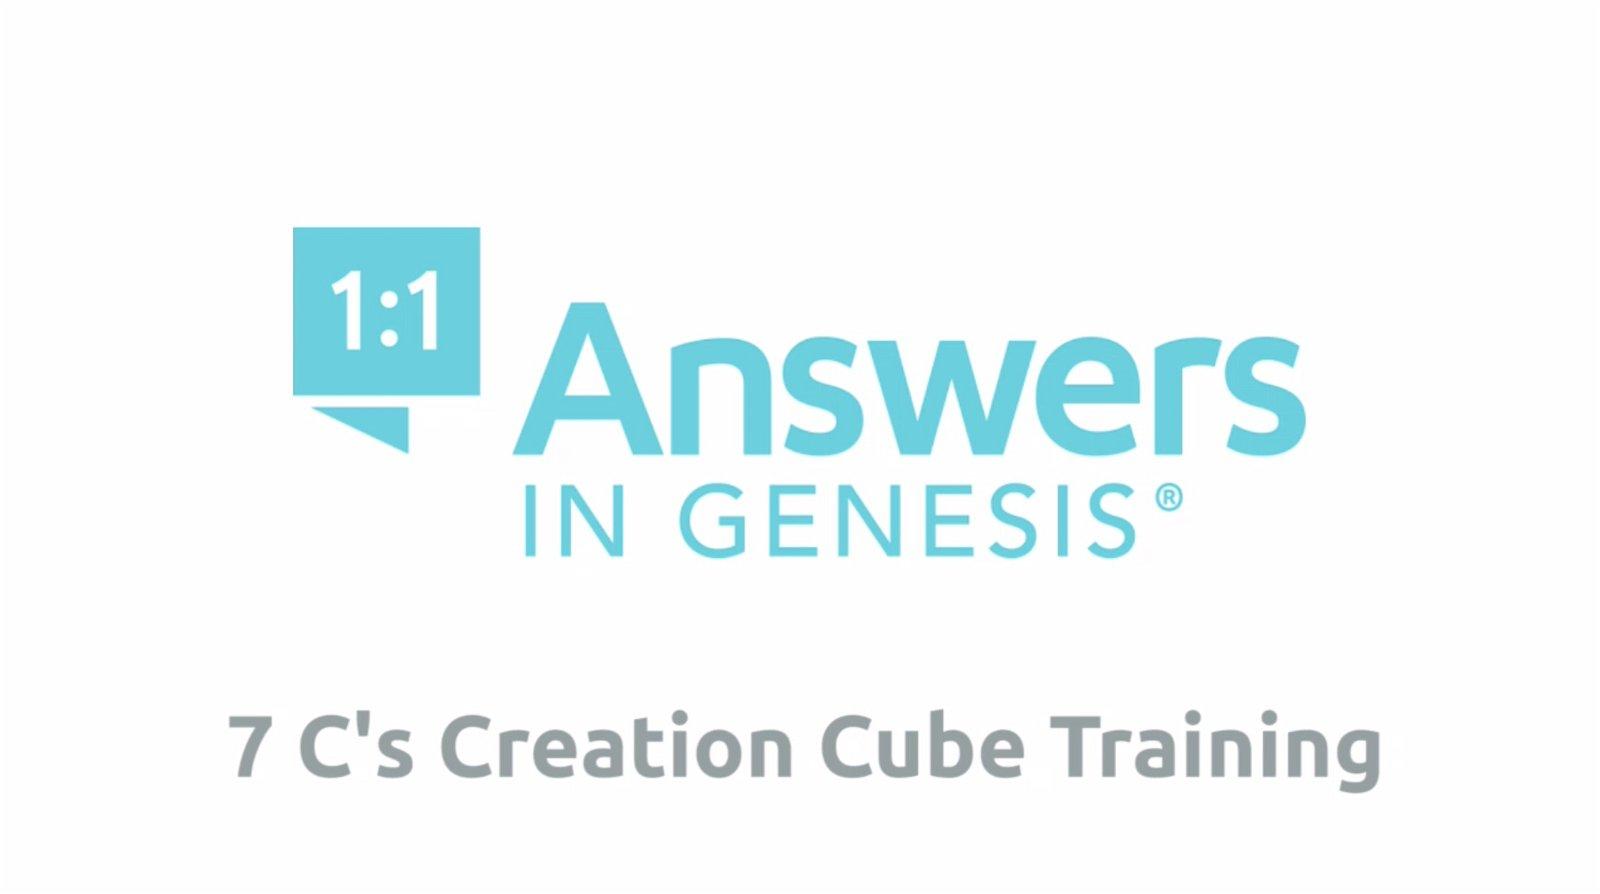 Seven C's Creation Cube Training